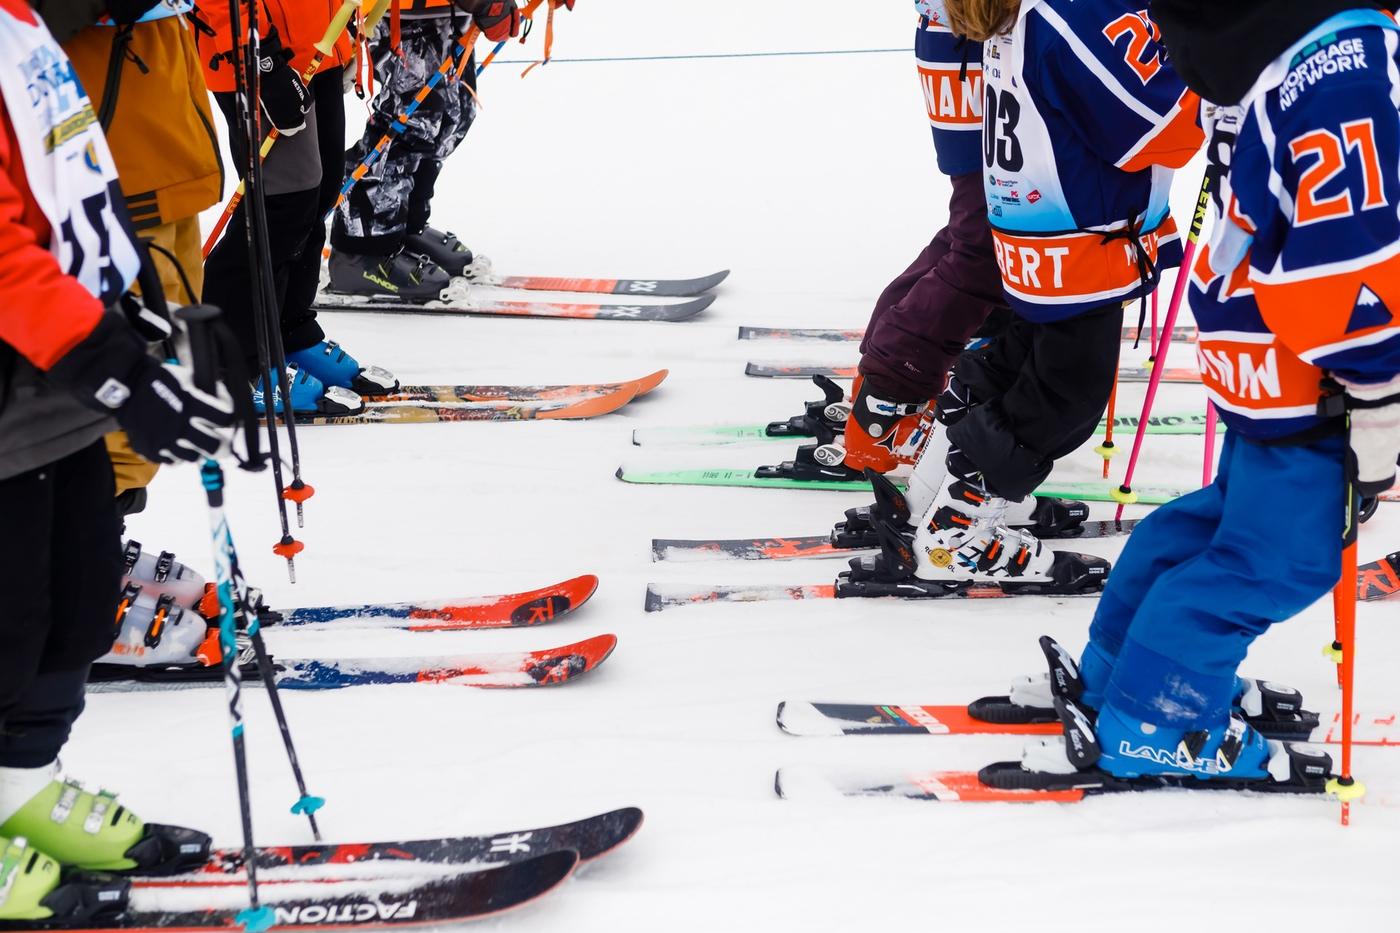 WinterKids Downhill 24 2021 SDP 2711